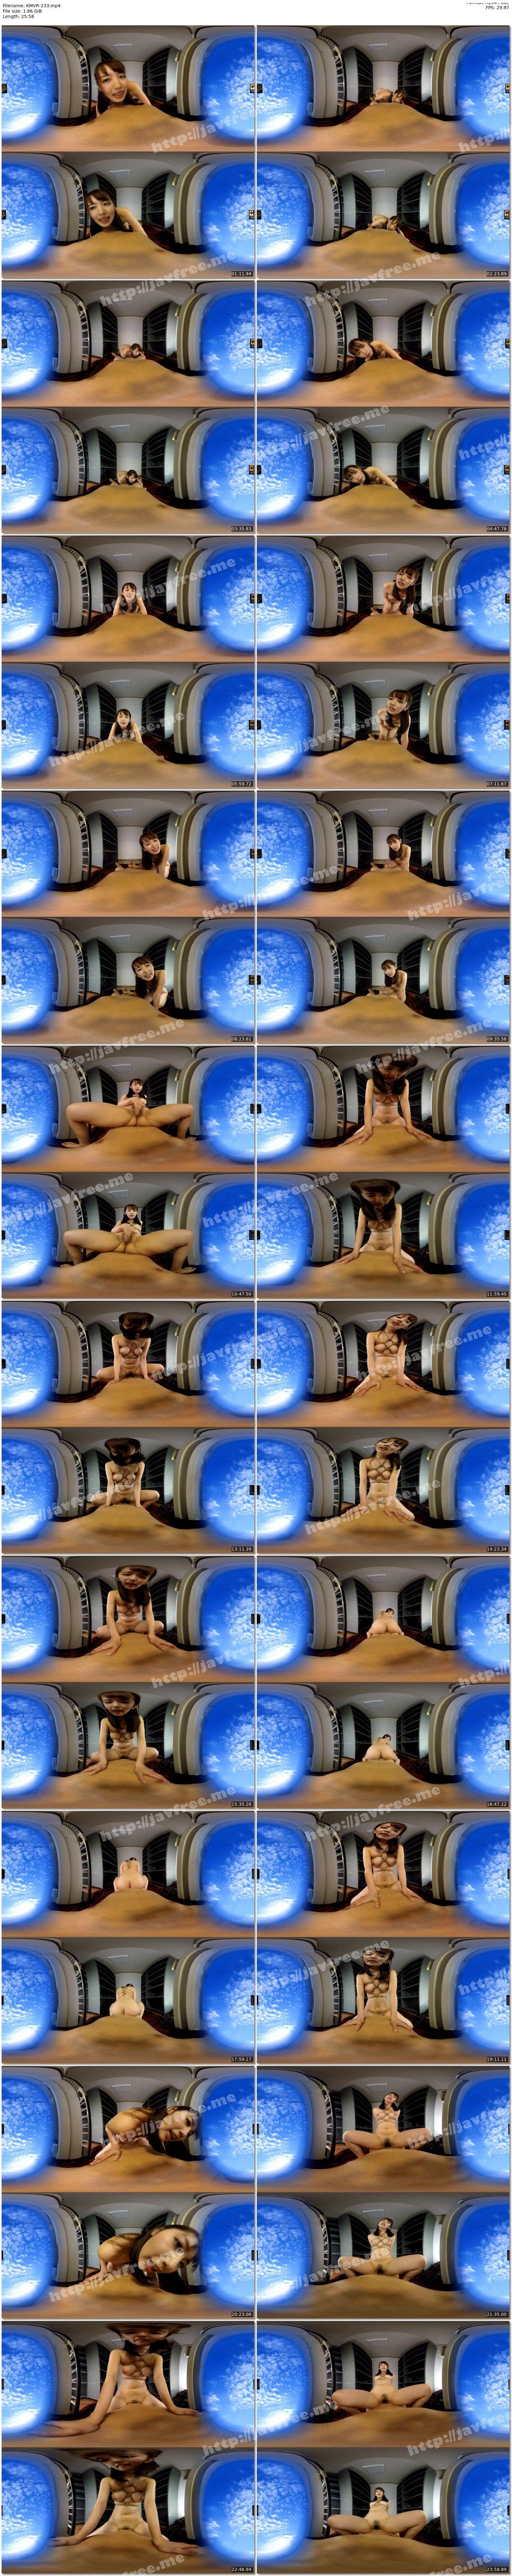 [KMVR-233] 【VR】緊縛中出し 美咲かんな Sではないが発射せずにはいられない! - image KMVR-233 on https://javfree.me